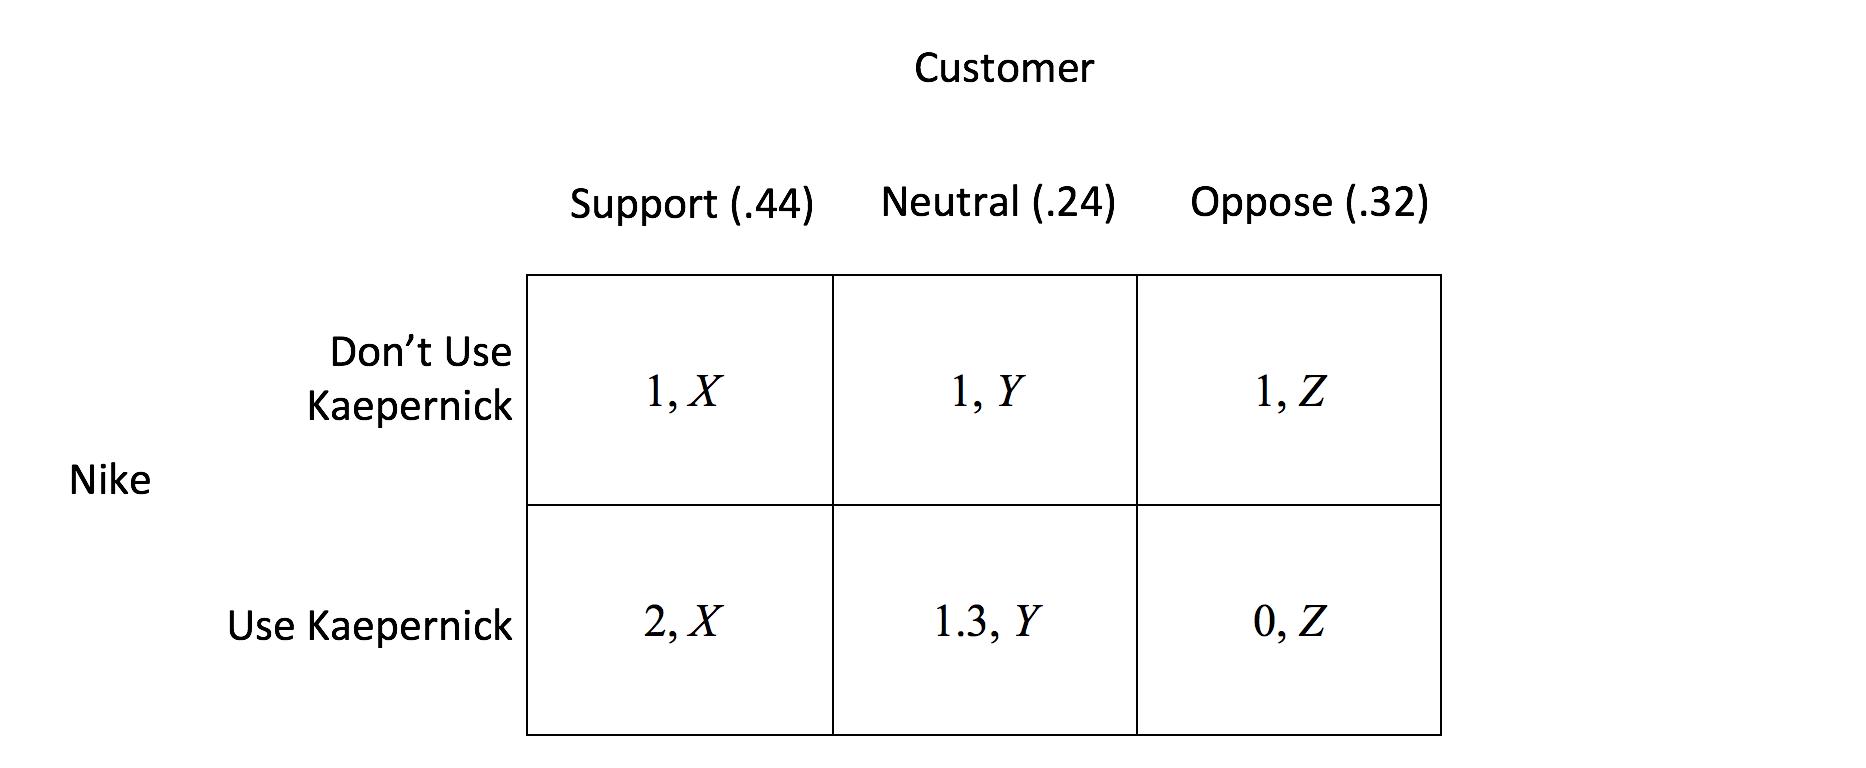 nike marketing research